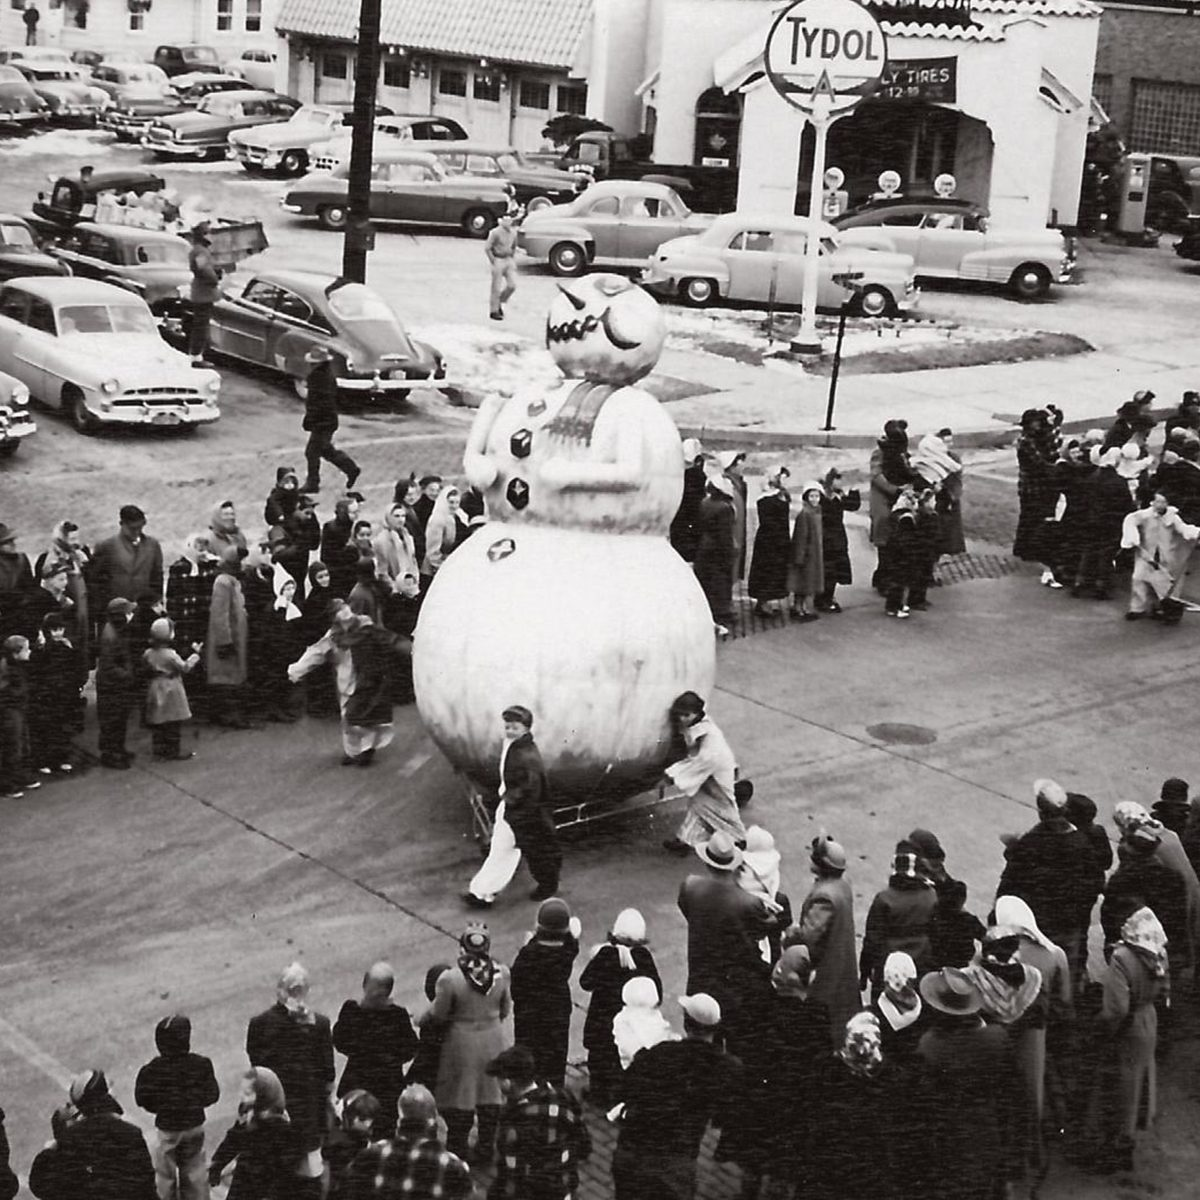 snowman float being wheeled down street during thanksgiving parade in Sheboygan Wi 1950s